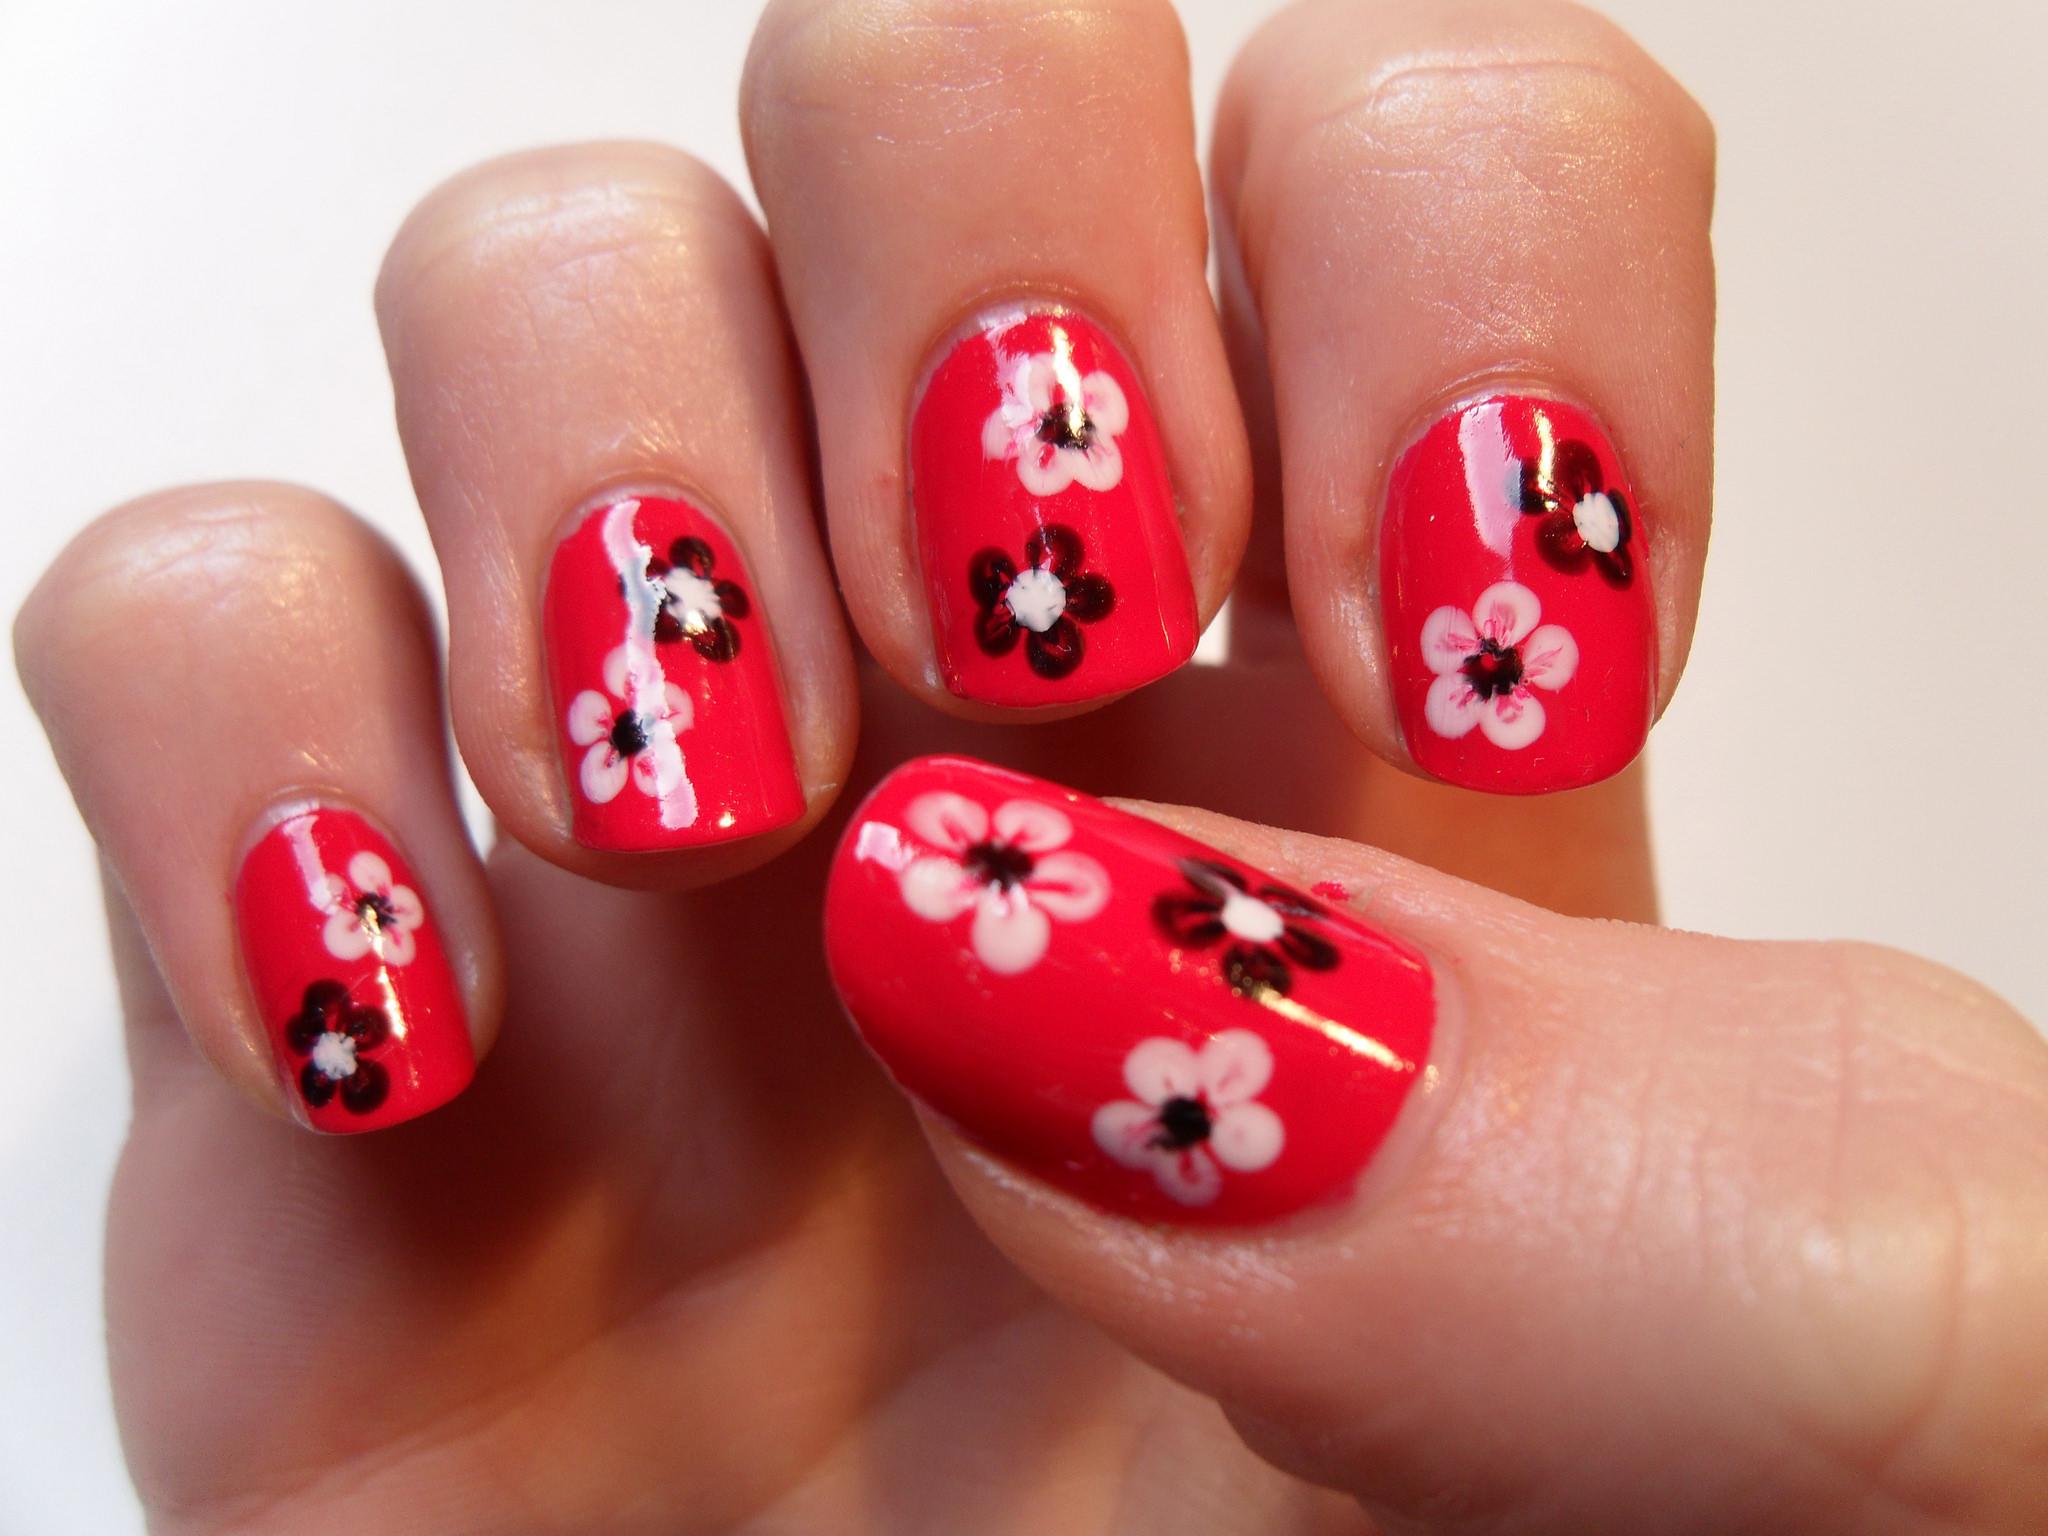 Fl Nail Art On Red Nails